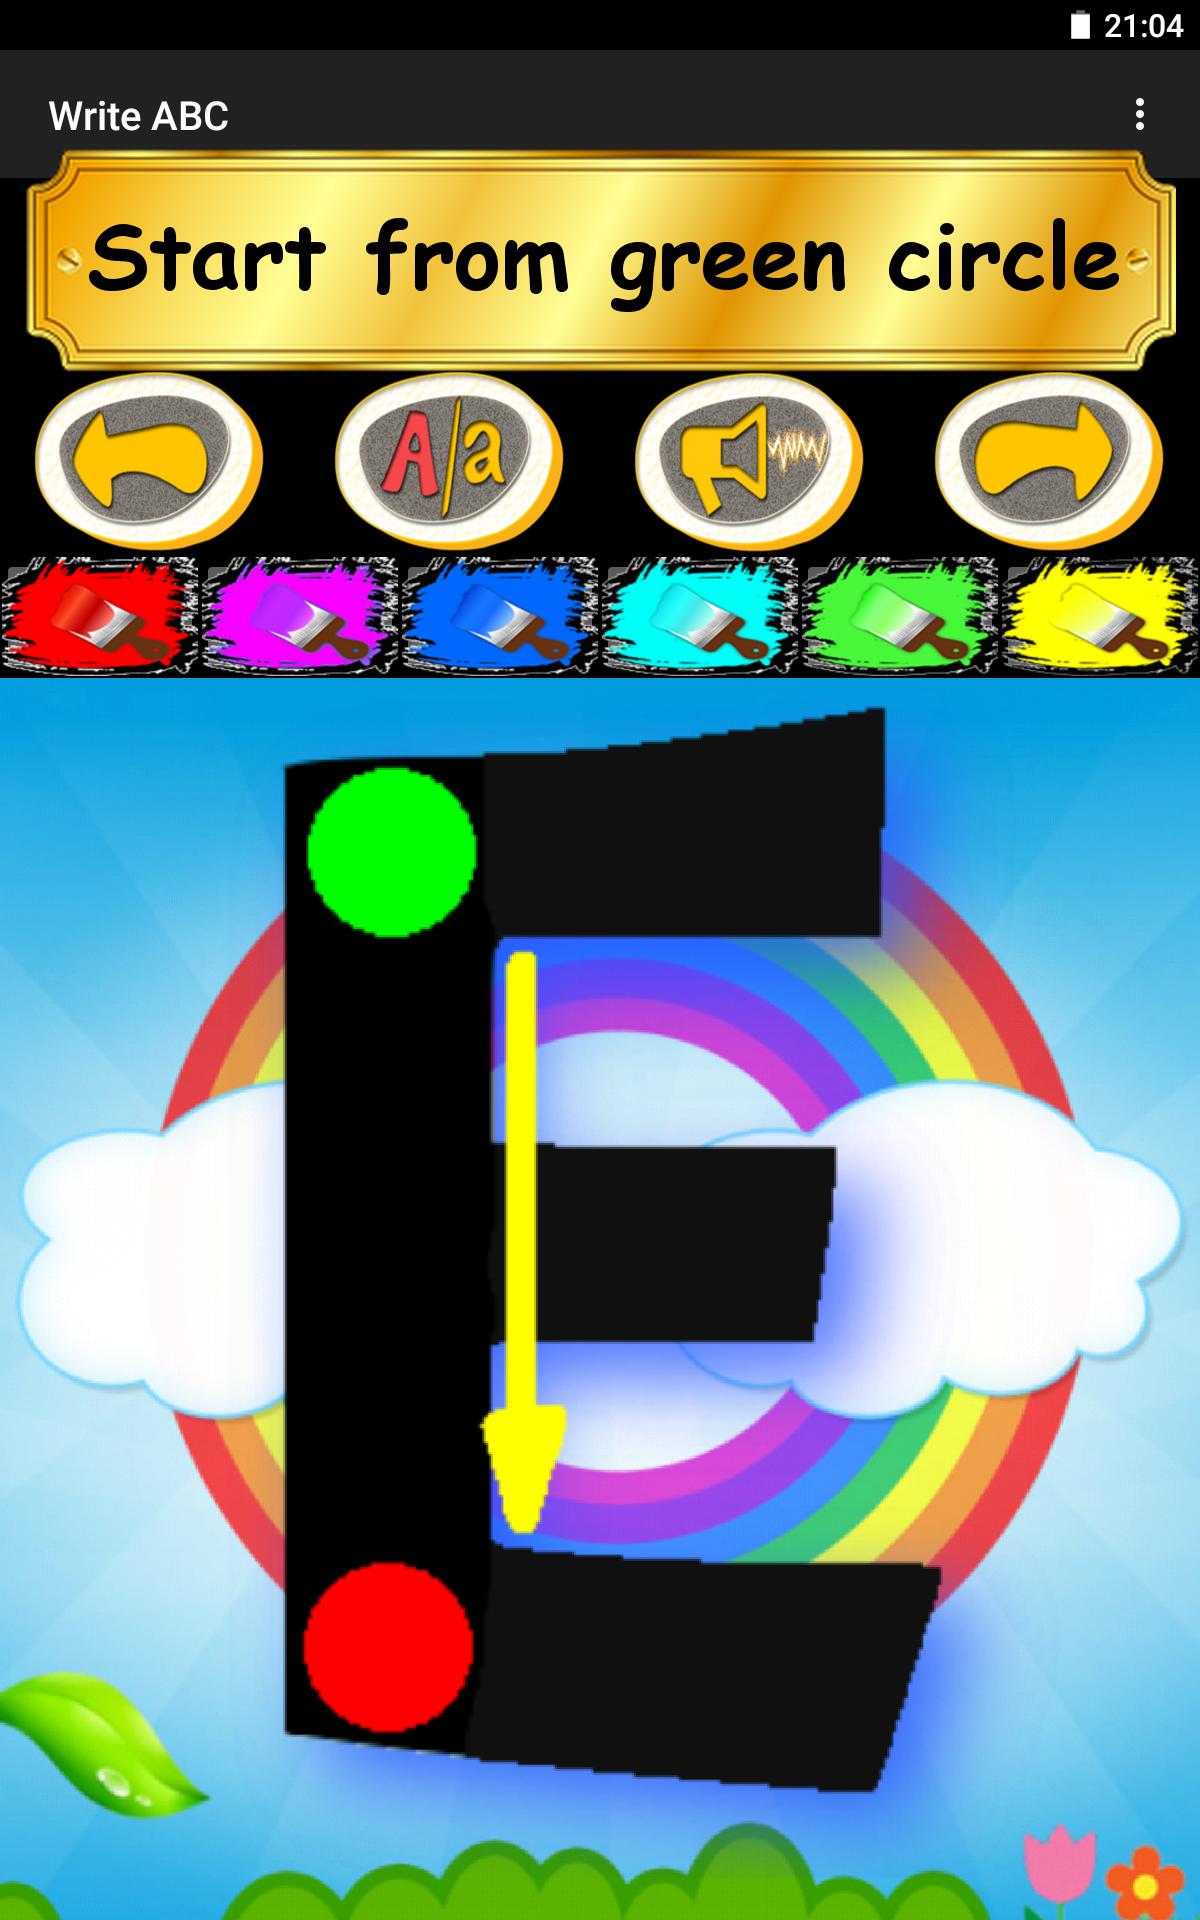 Write ABC - Learn Alphabets screenshot #21